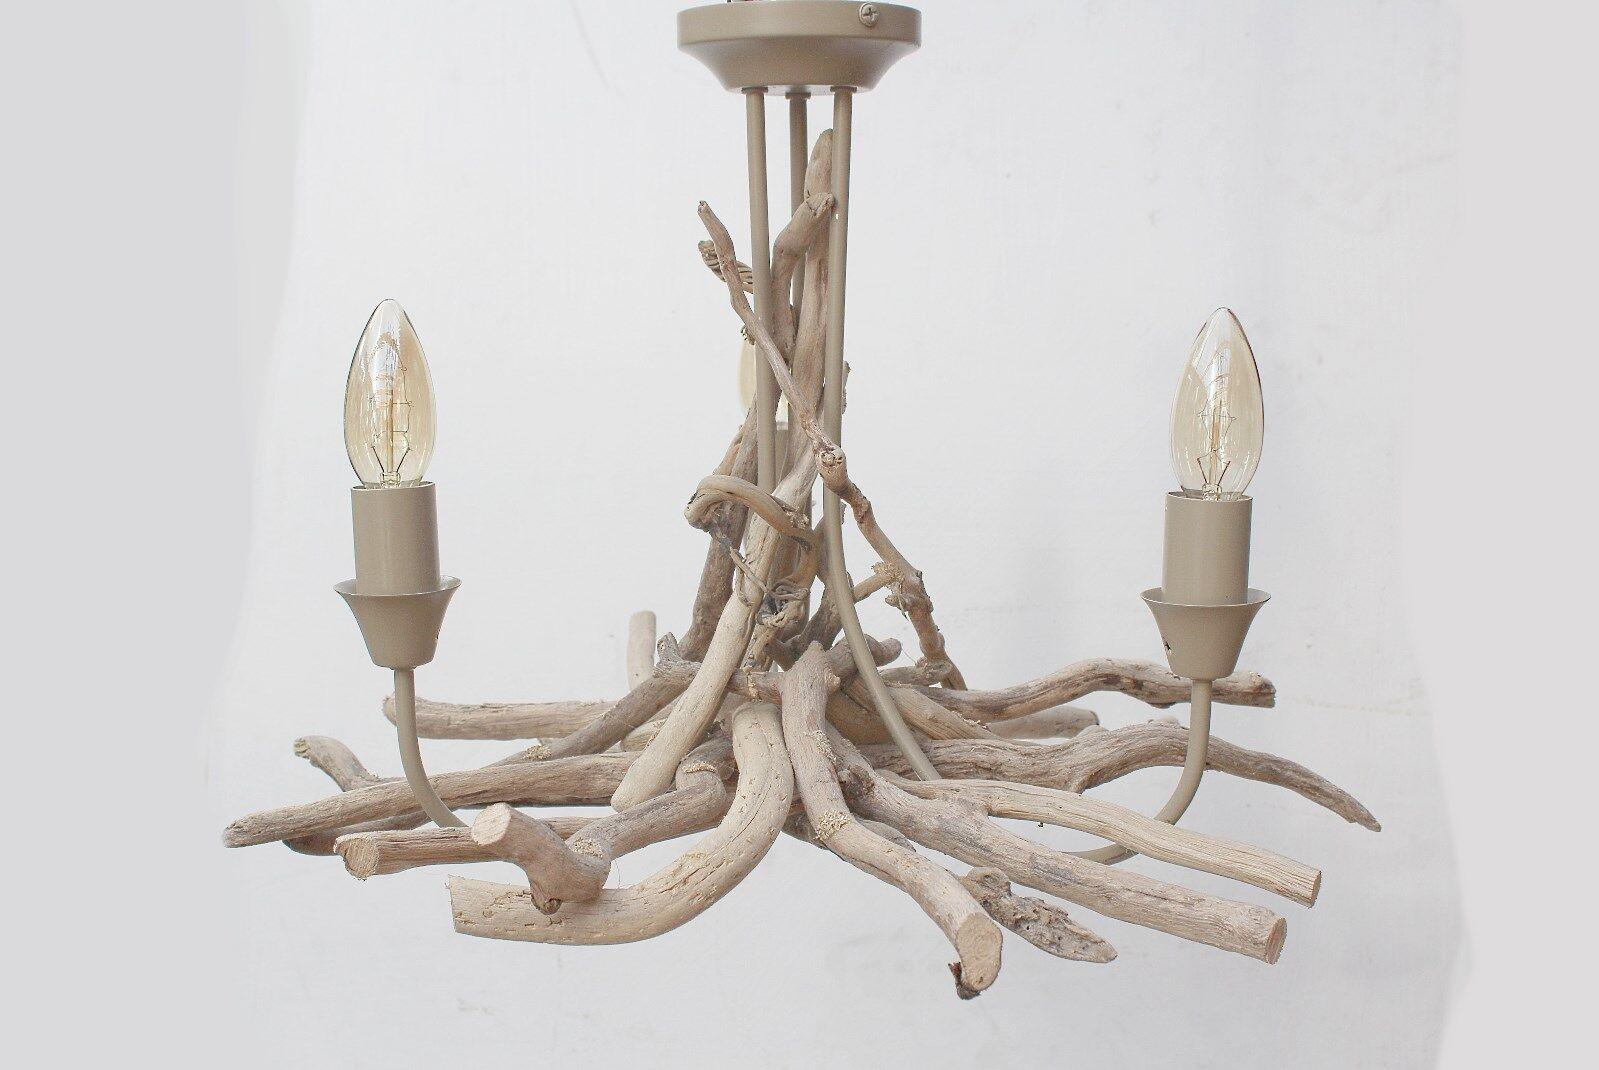 Driftwood Lampadario, Driftwood branchthree RACCORDO DI LUCE 39 CENTIMETRI GOCCIA Drift Wood